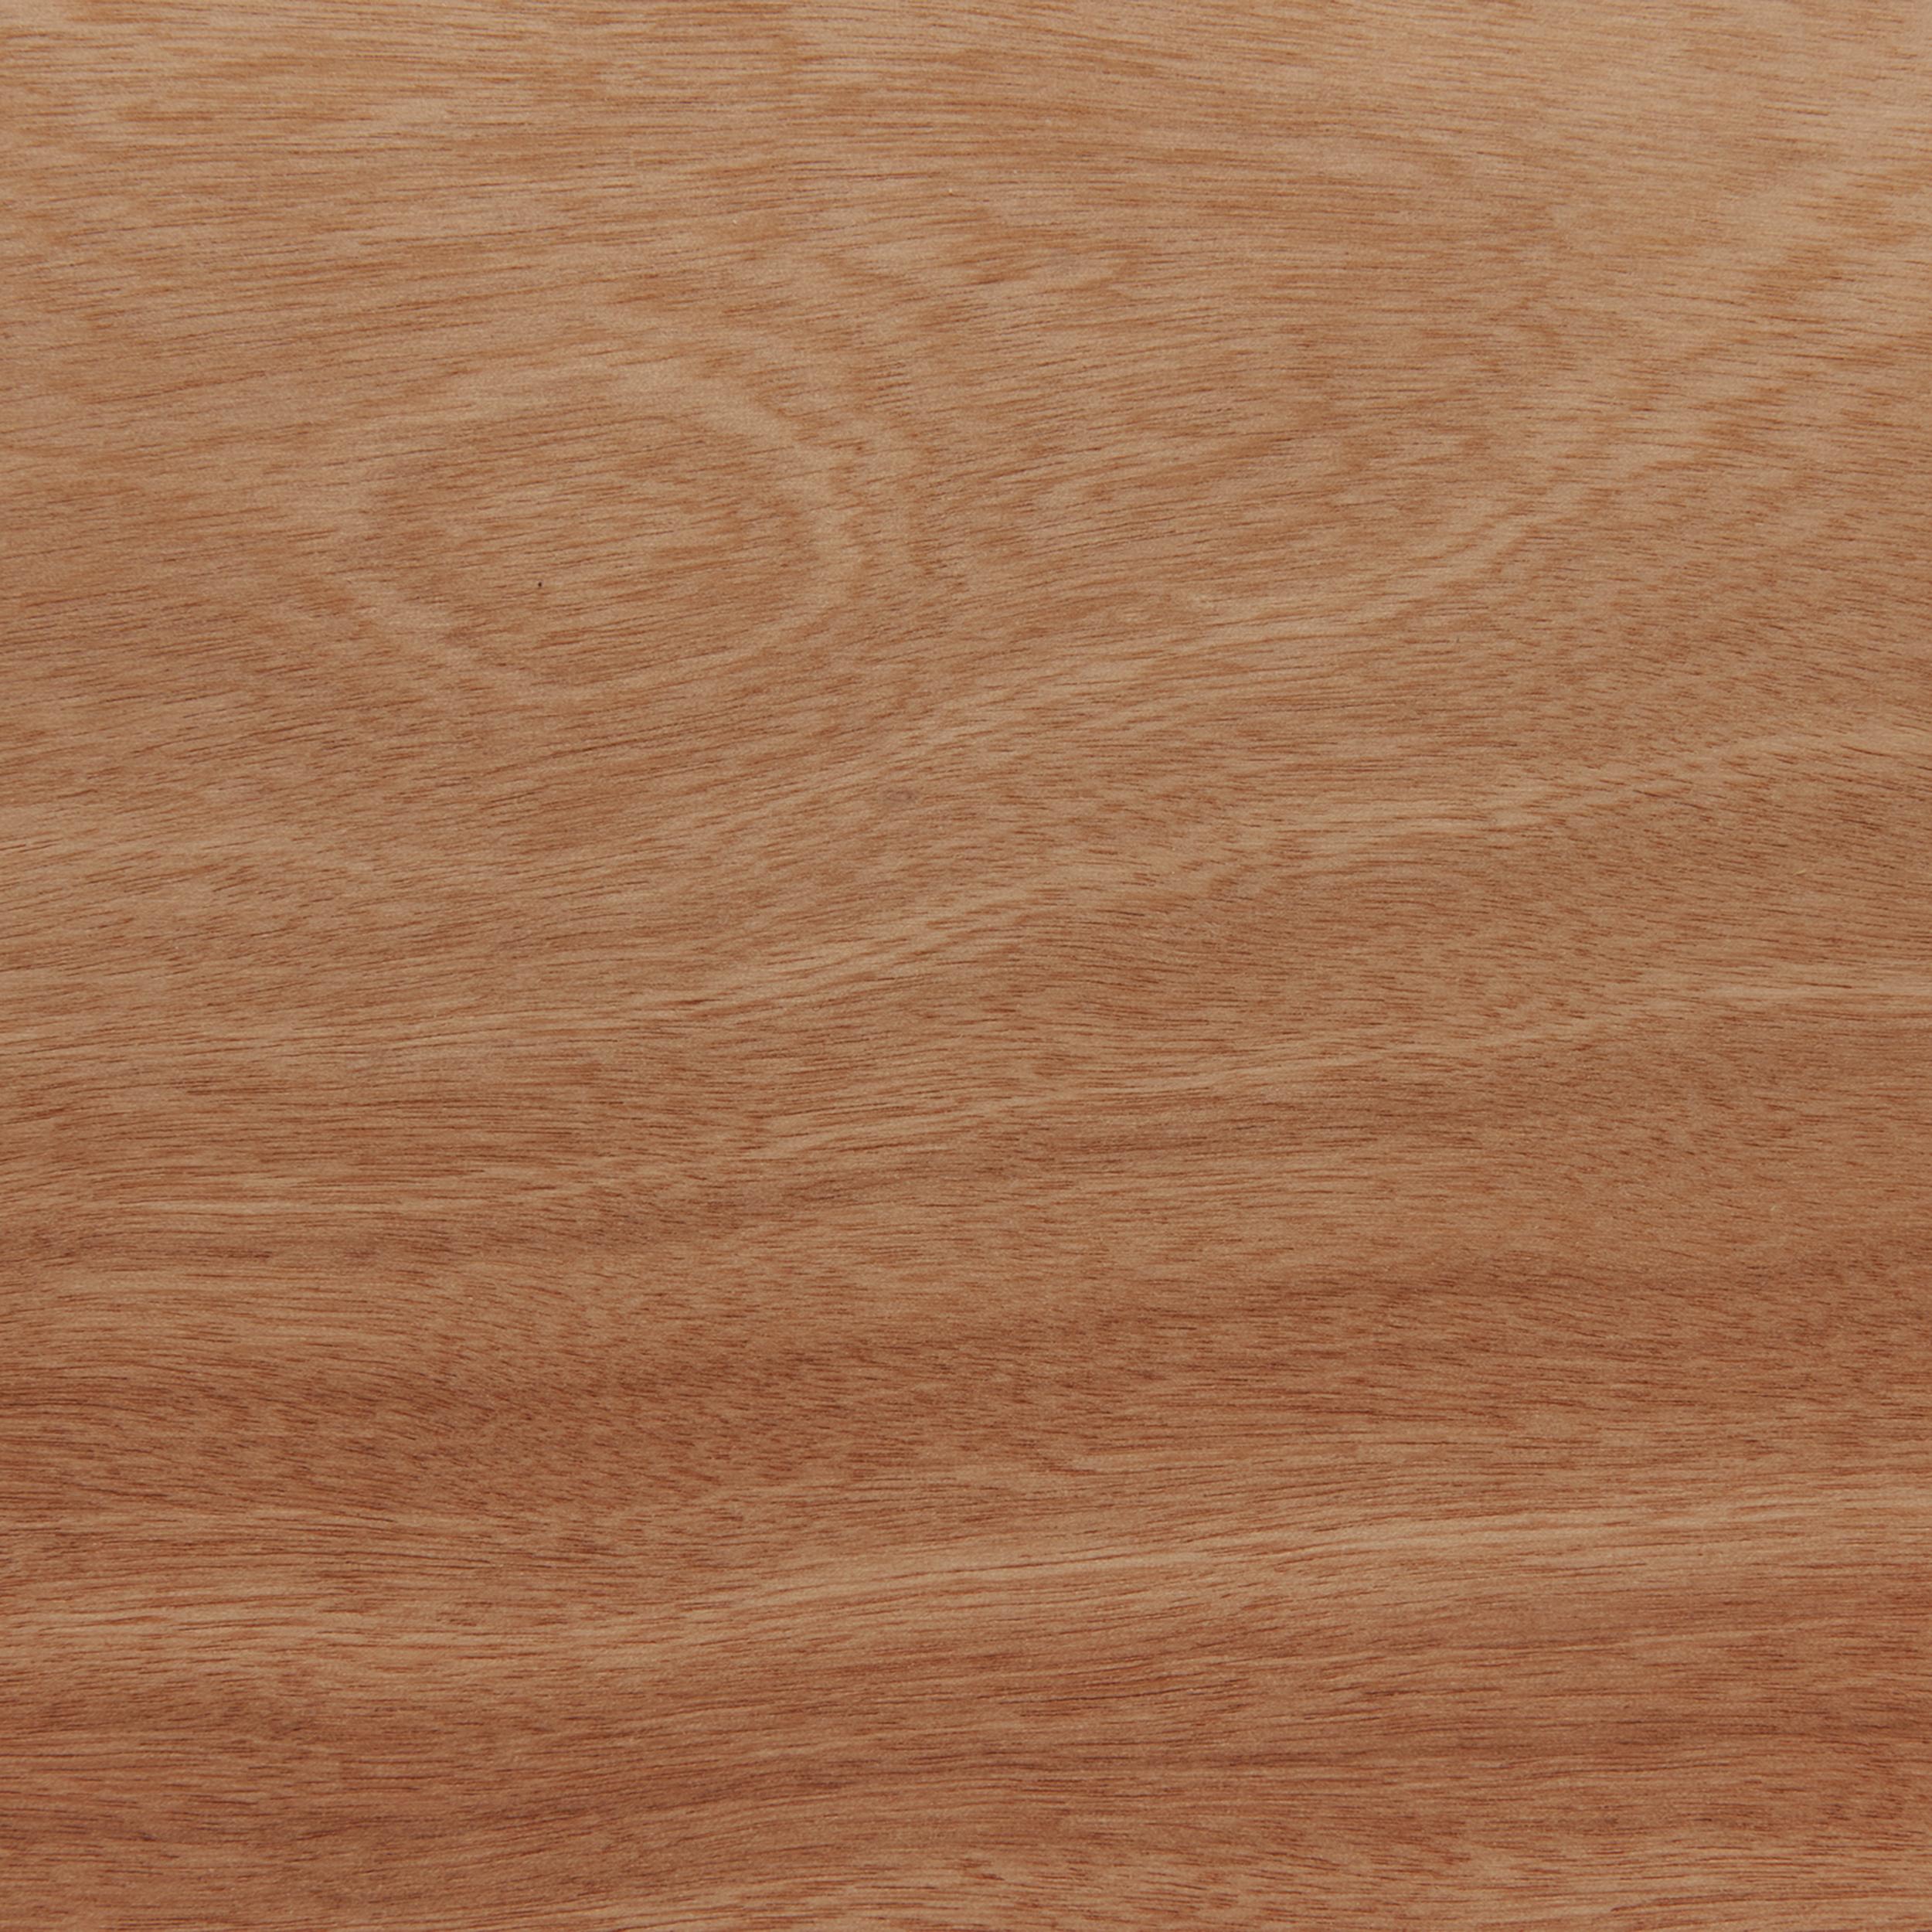 Spanish Cedar 4'X8' Veneer Sheet, 3M PSA Backed